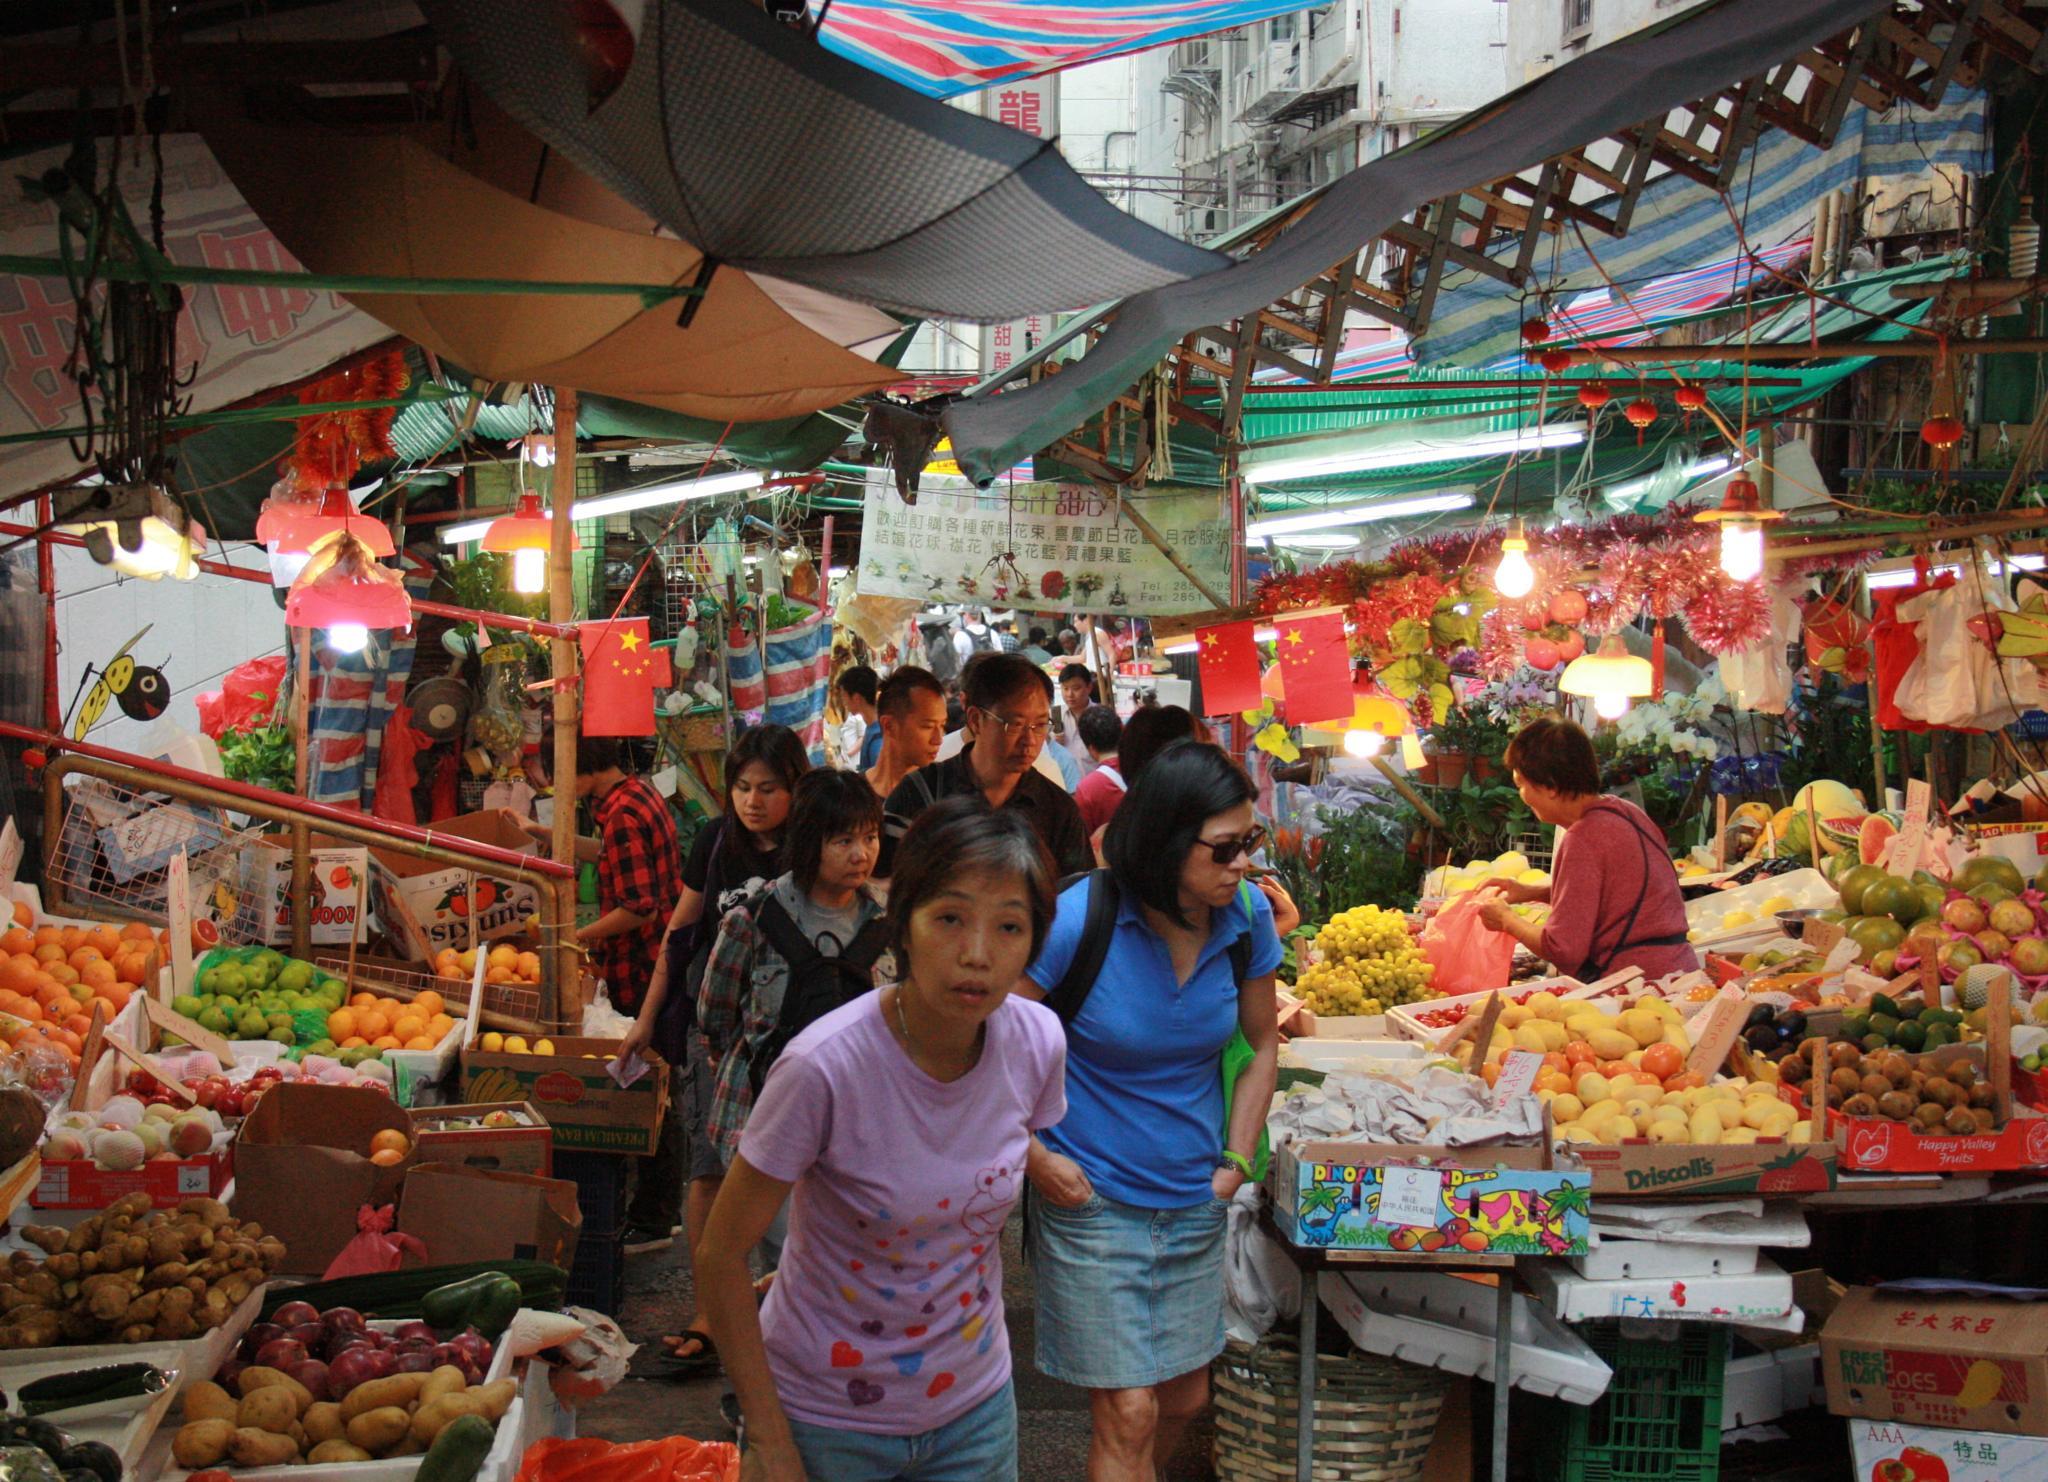 Colourful Hong Kong Market by Slimboyfat